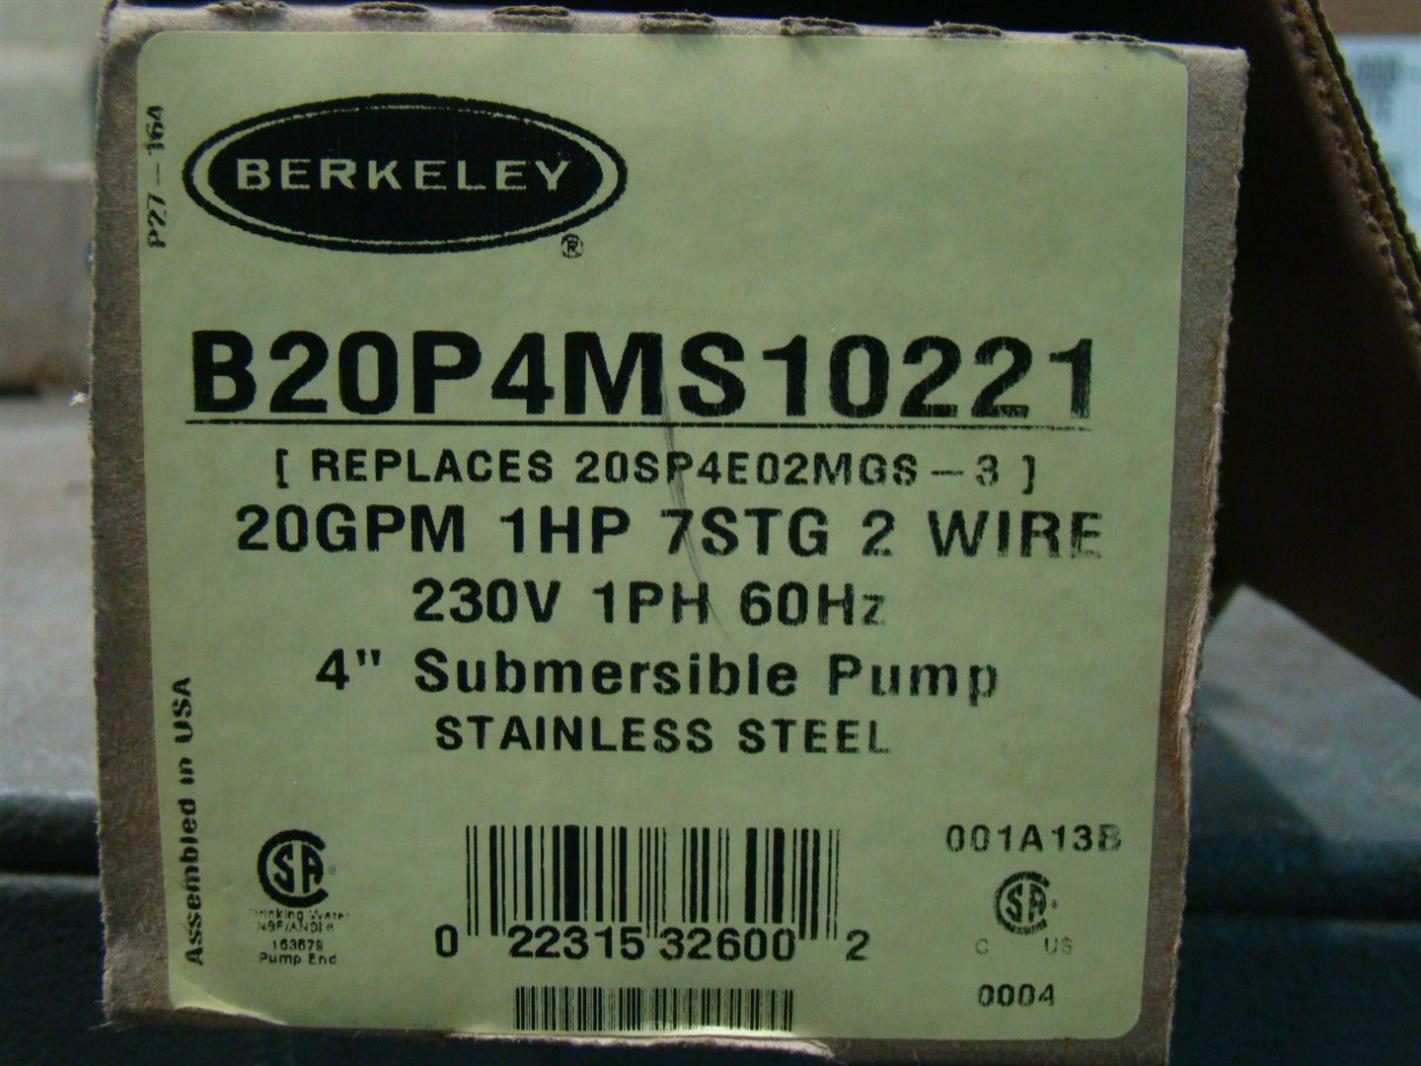 franklin water pump wiring diagram franklin submersible pump control on wiring 3 wire submersible pump, wiring 230 volt 2 speed pool pump, wiring a 220 well pump, wiring for submersible well pump, wiring a grundfos pump,